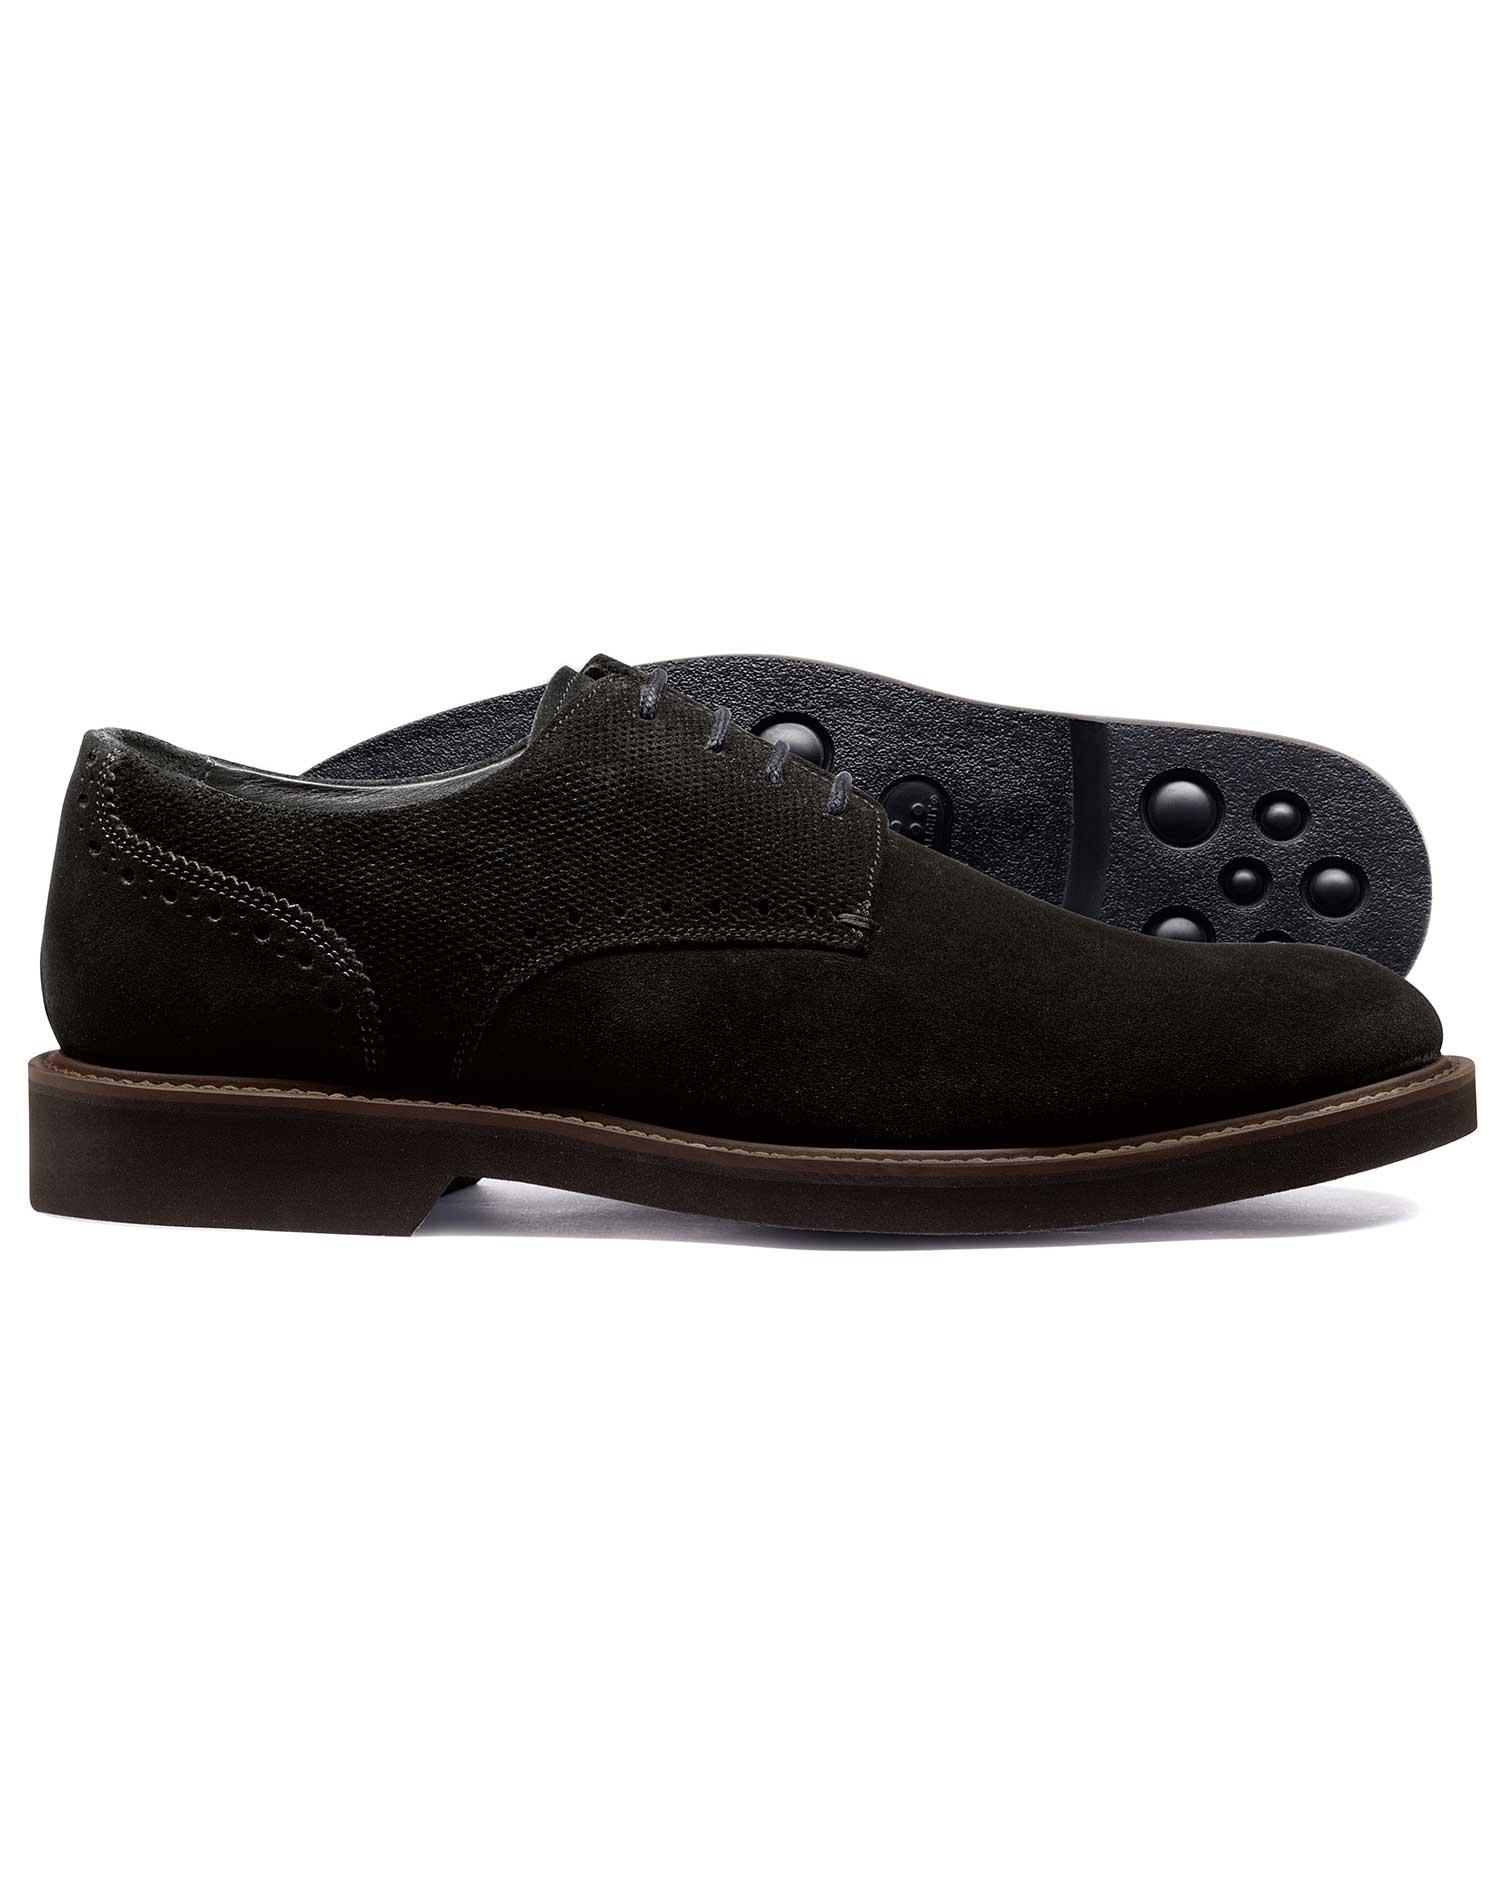 Black Extra Lightweight Derby Shoe Size 13 R by Charles Tyrwhitt